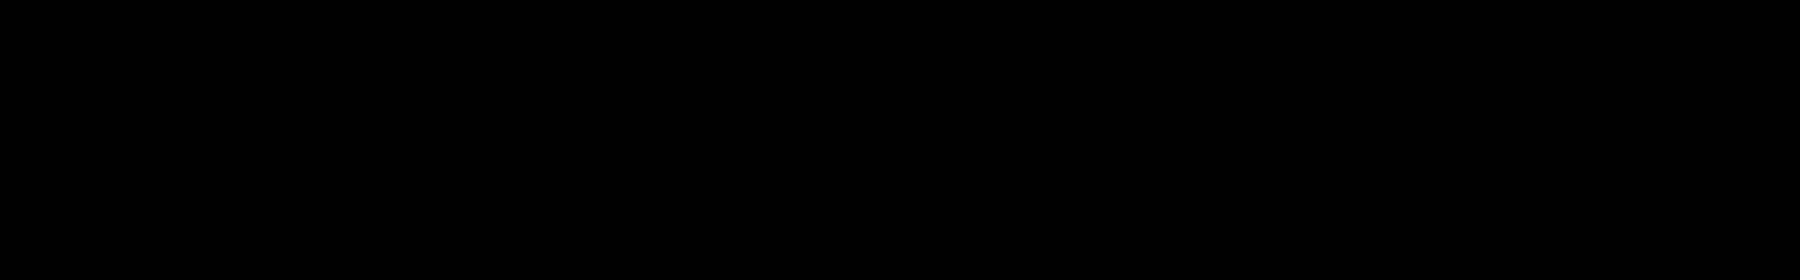 Black Techno 2 audio waveform